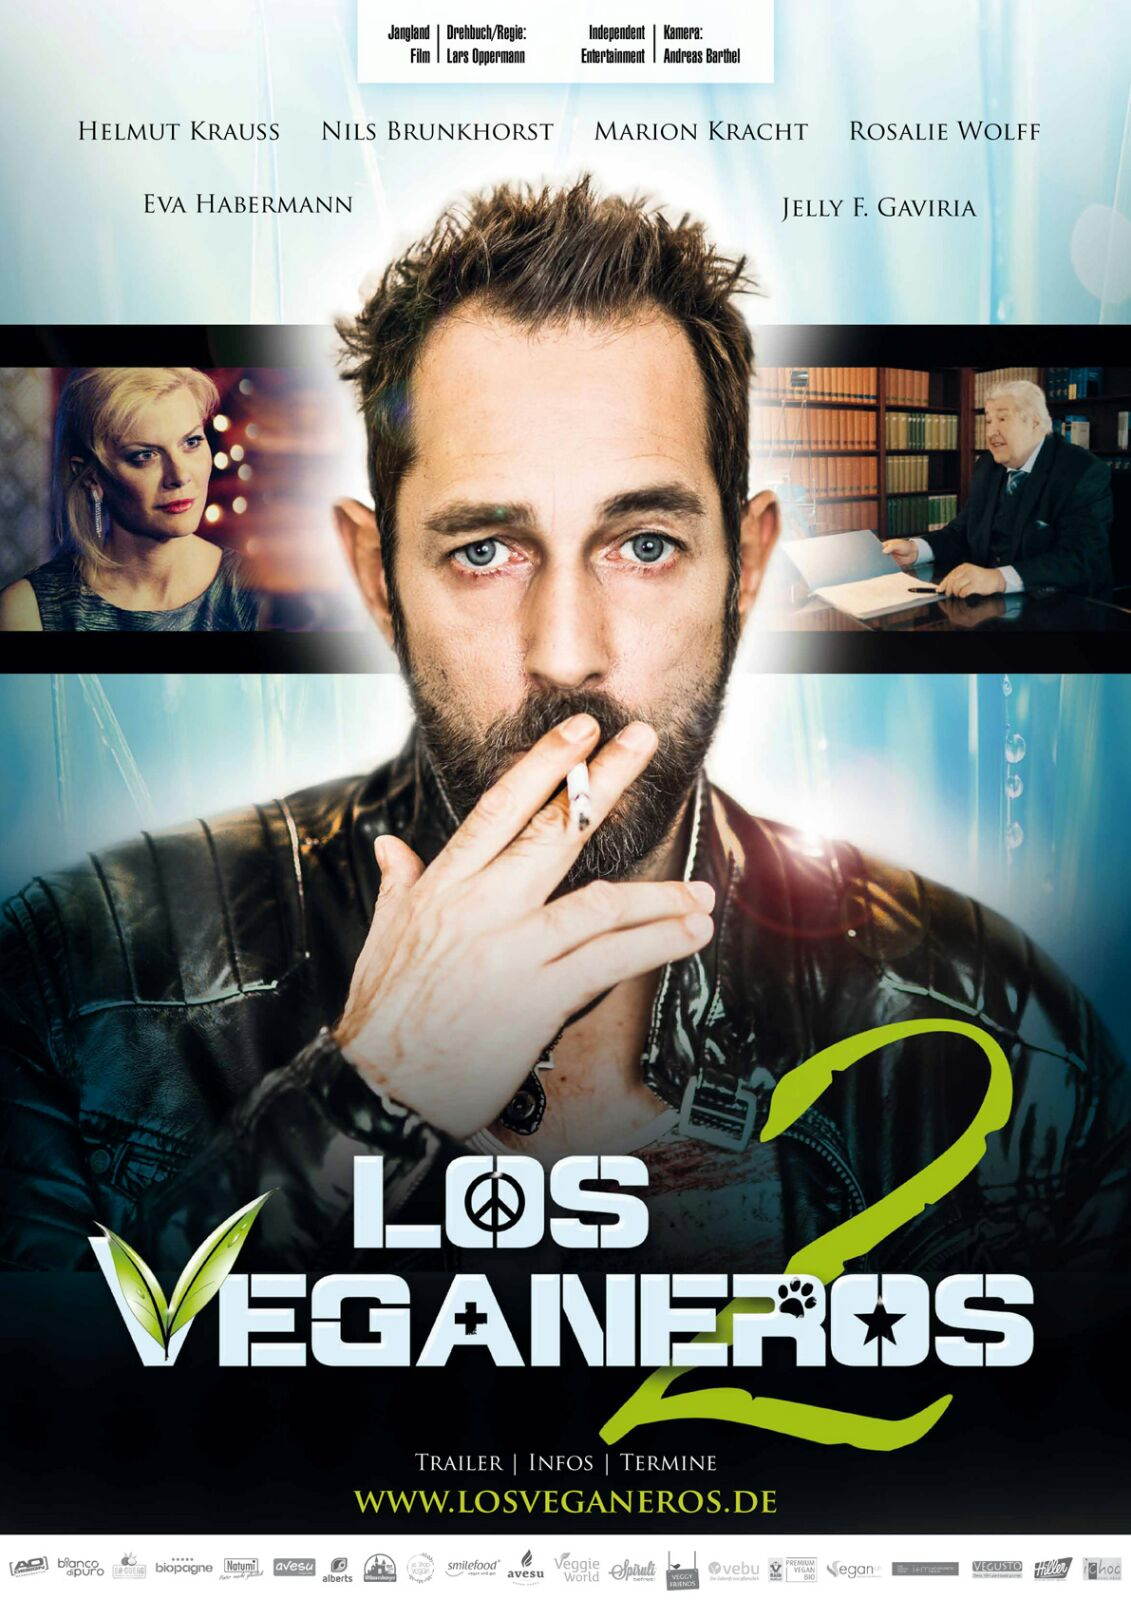 los-veganeros-2-filmplakat